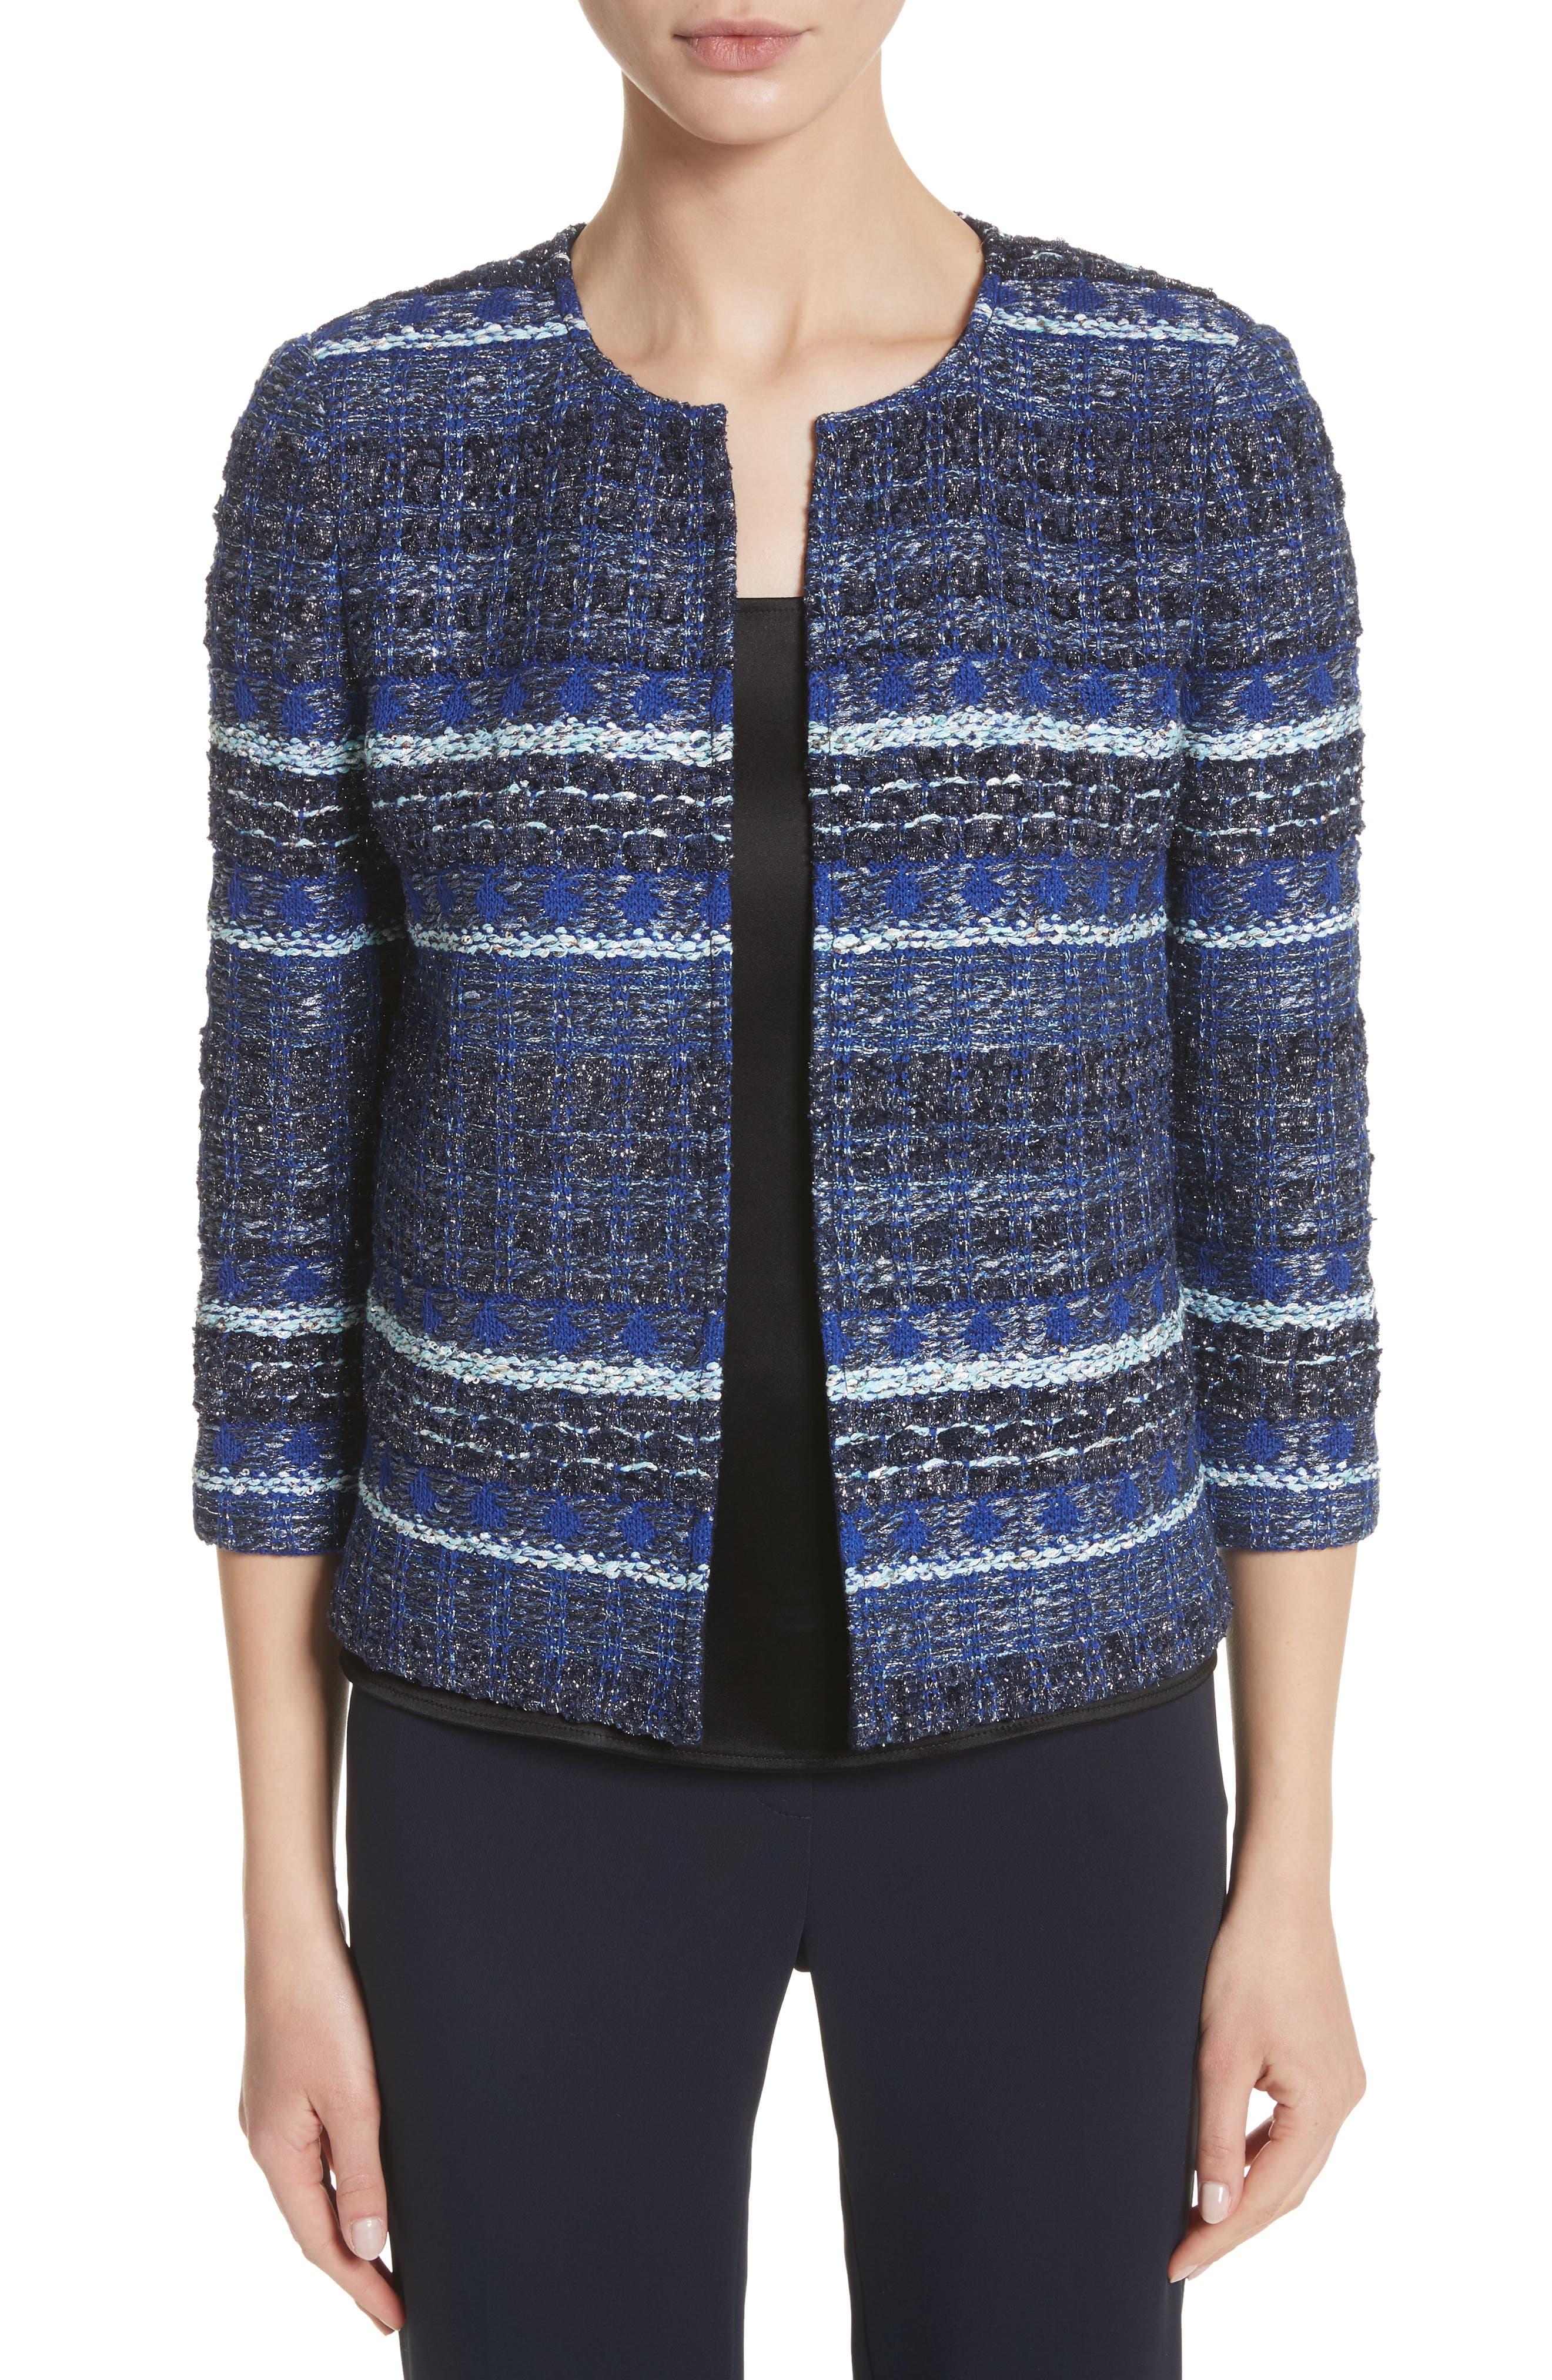 ST. JOHN COLLECTION,                             Stripe Tweed Jacket,                             Main thumbnail 1, color,                             NAVY MULTI